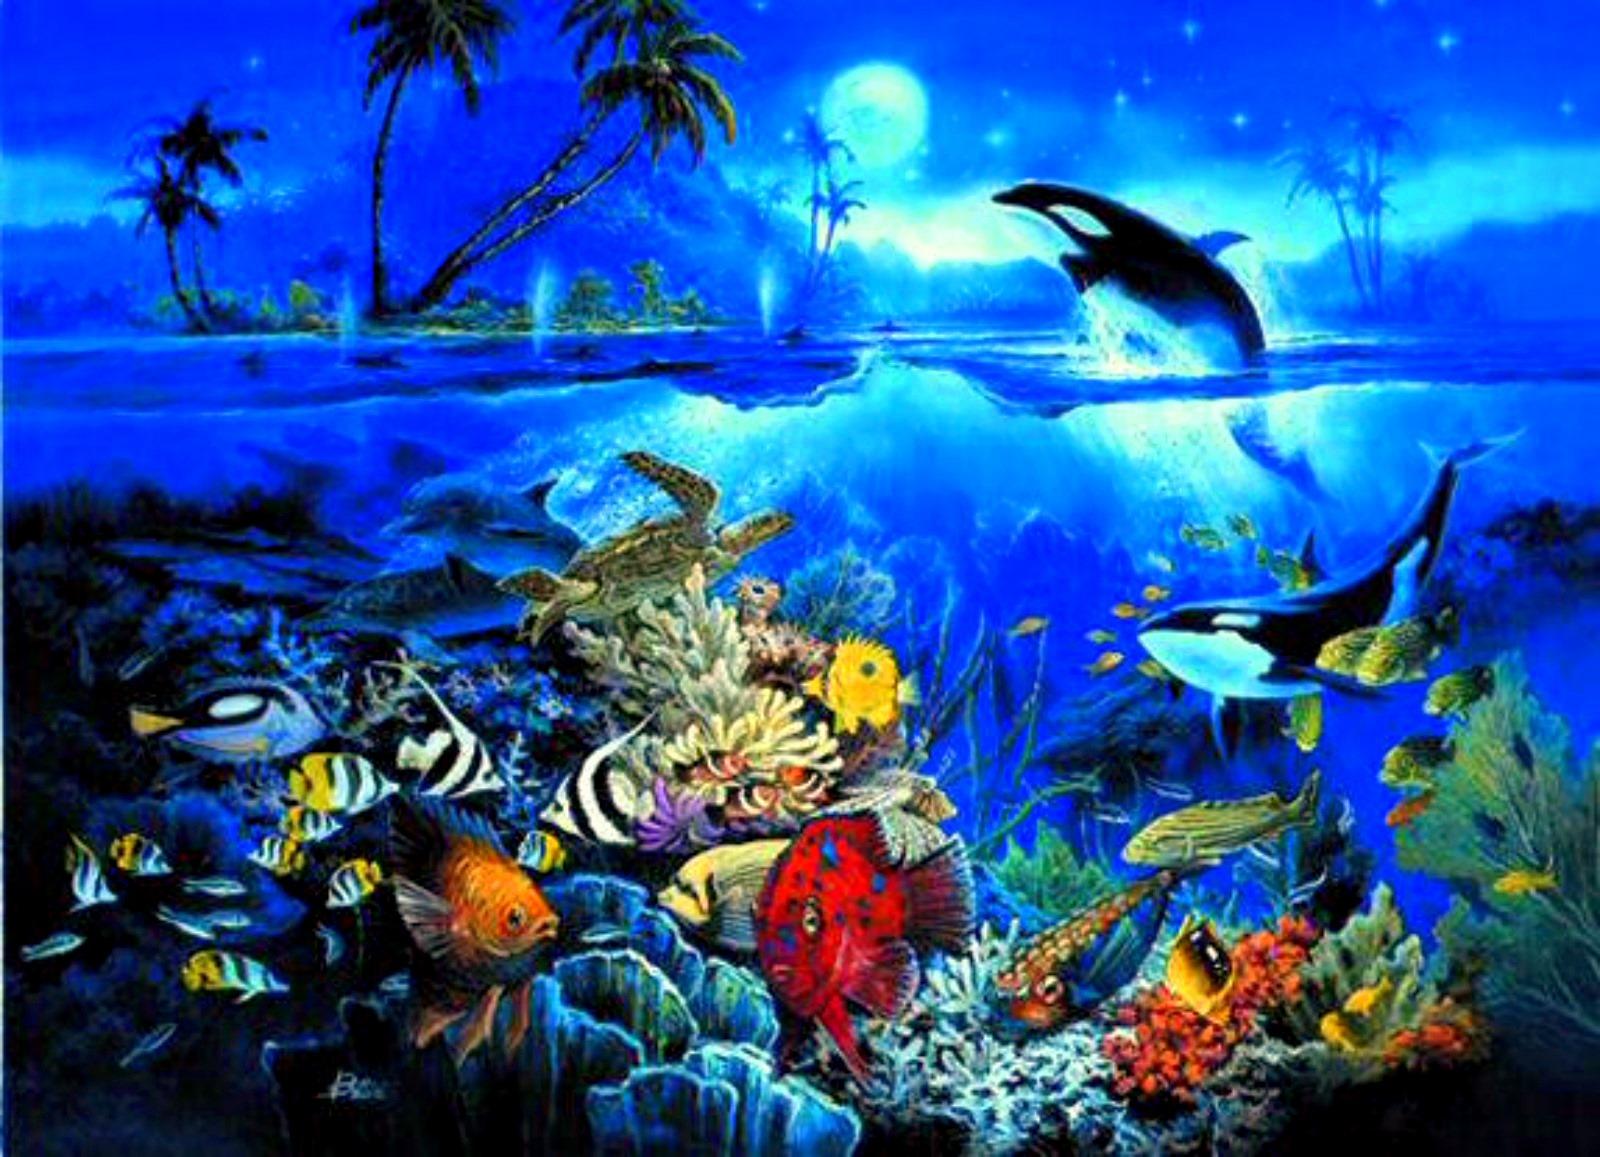 Hd wallpaper underwater - Underwater Ocean Backgrounds Hd Wallpaper Background